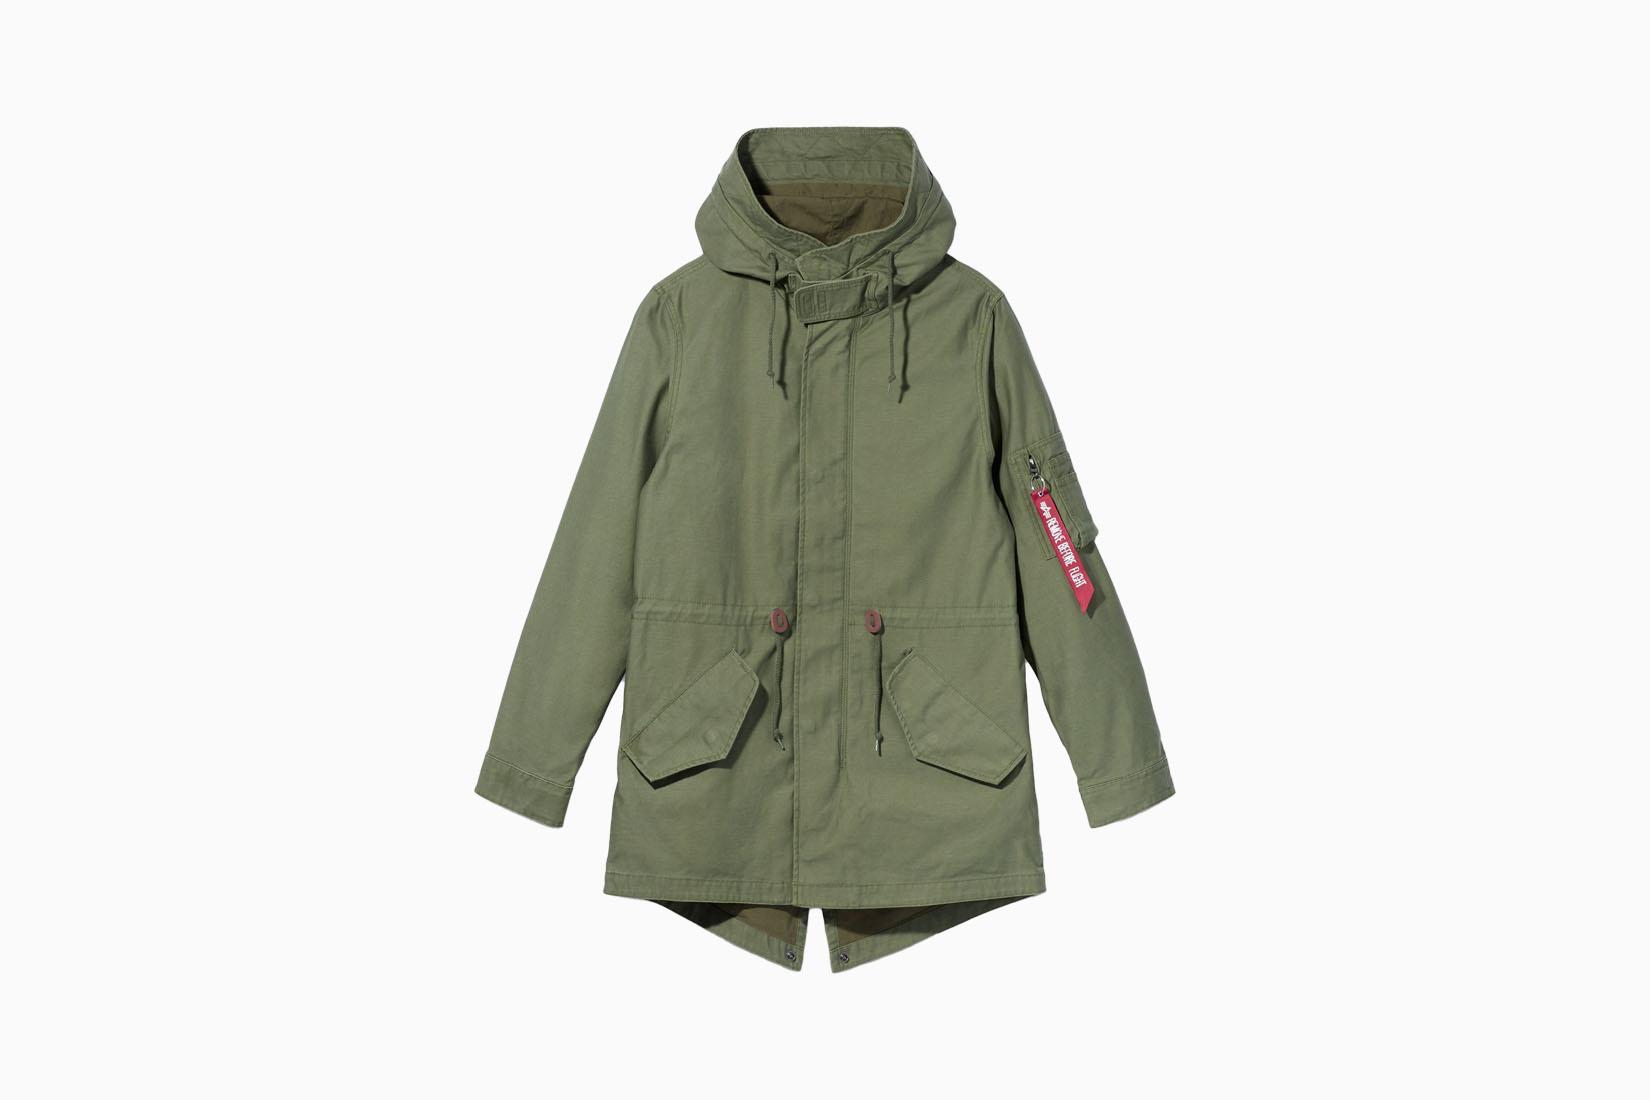 best men field jackets alpha industries m 59 review Luxe Digital